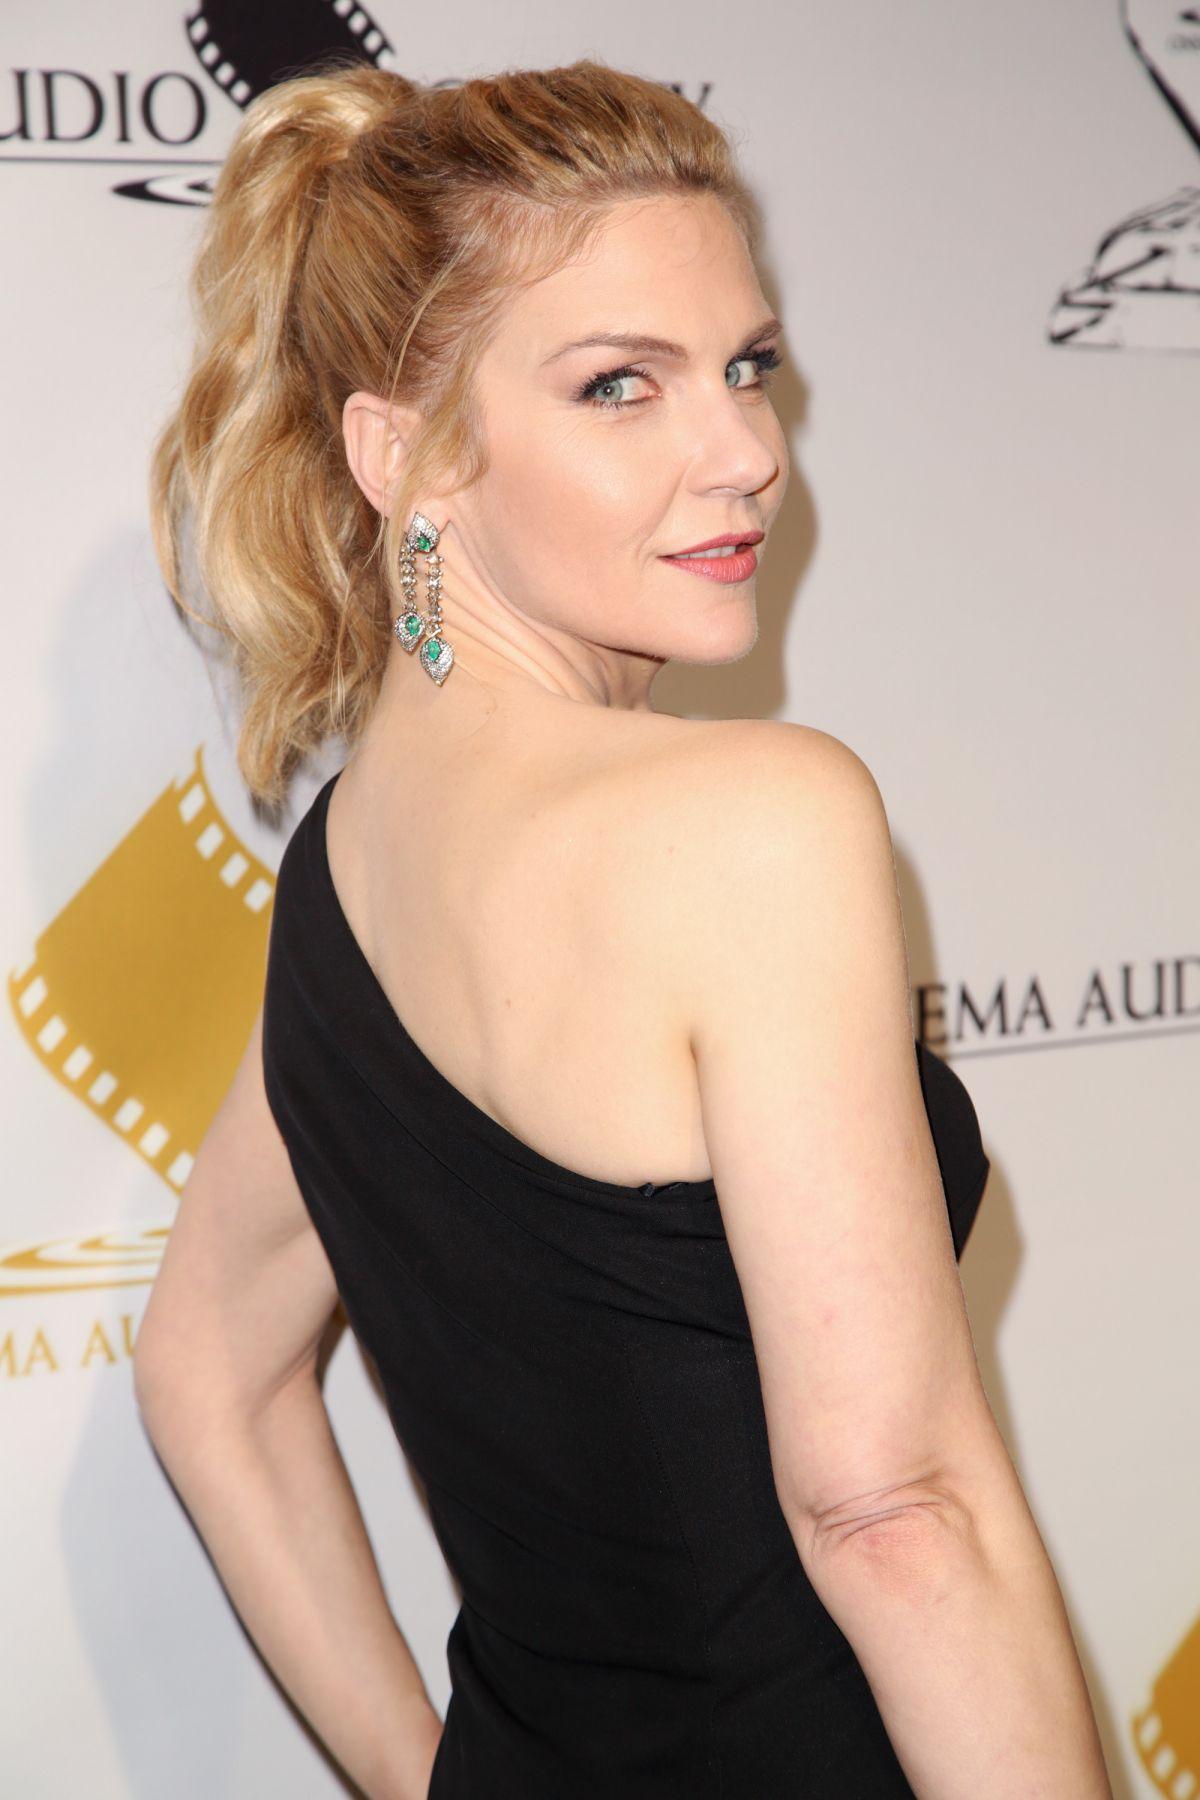 RHEA SEEHORN at Cinema Audio Society Awards in Los Angeles 02/19/2017